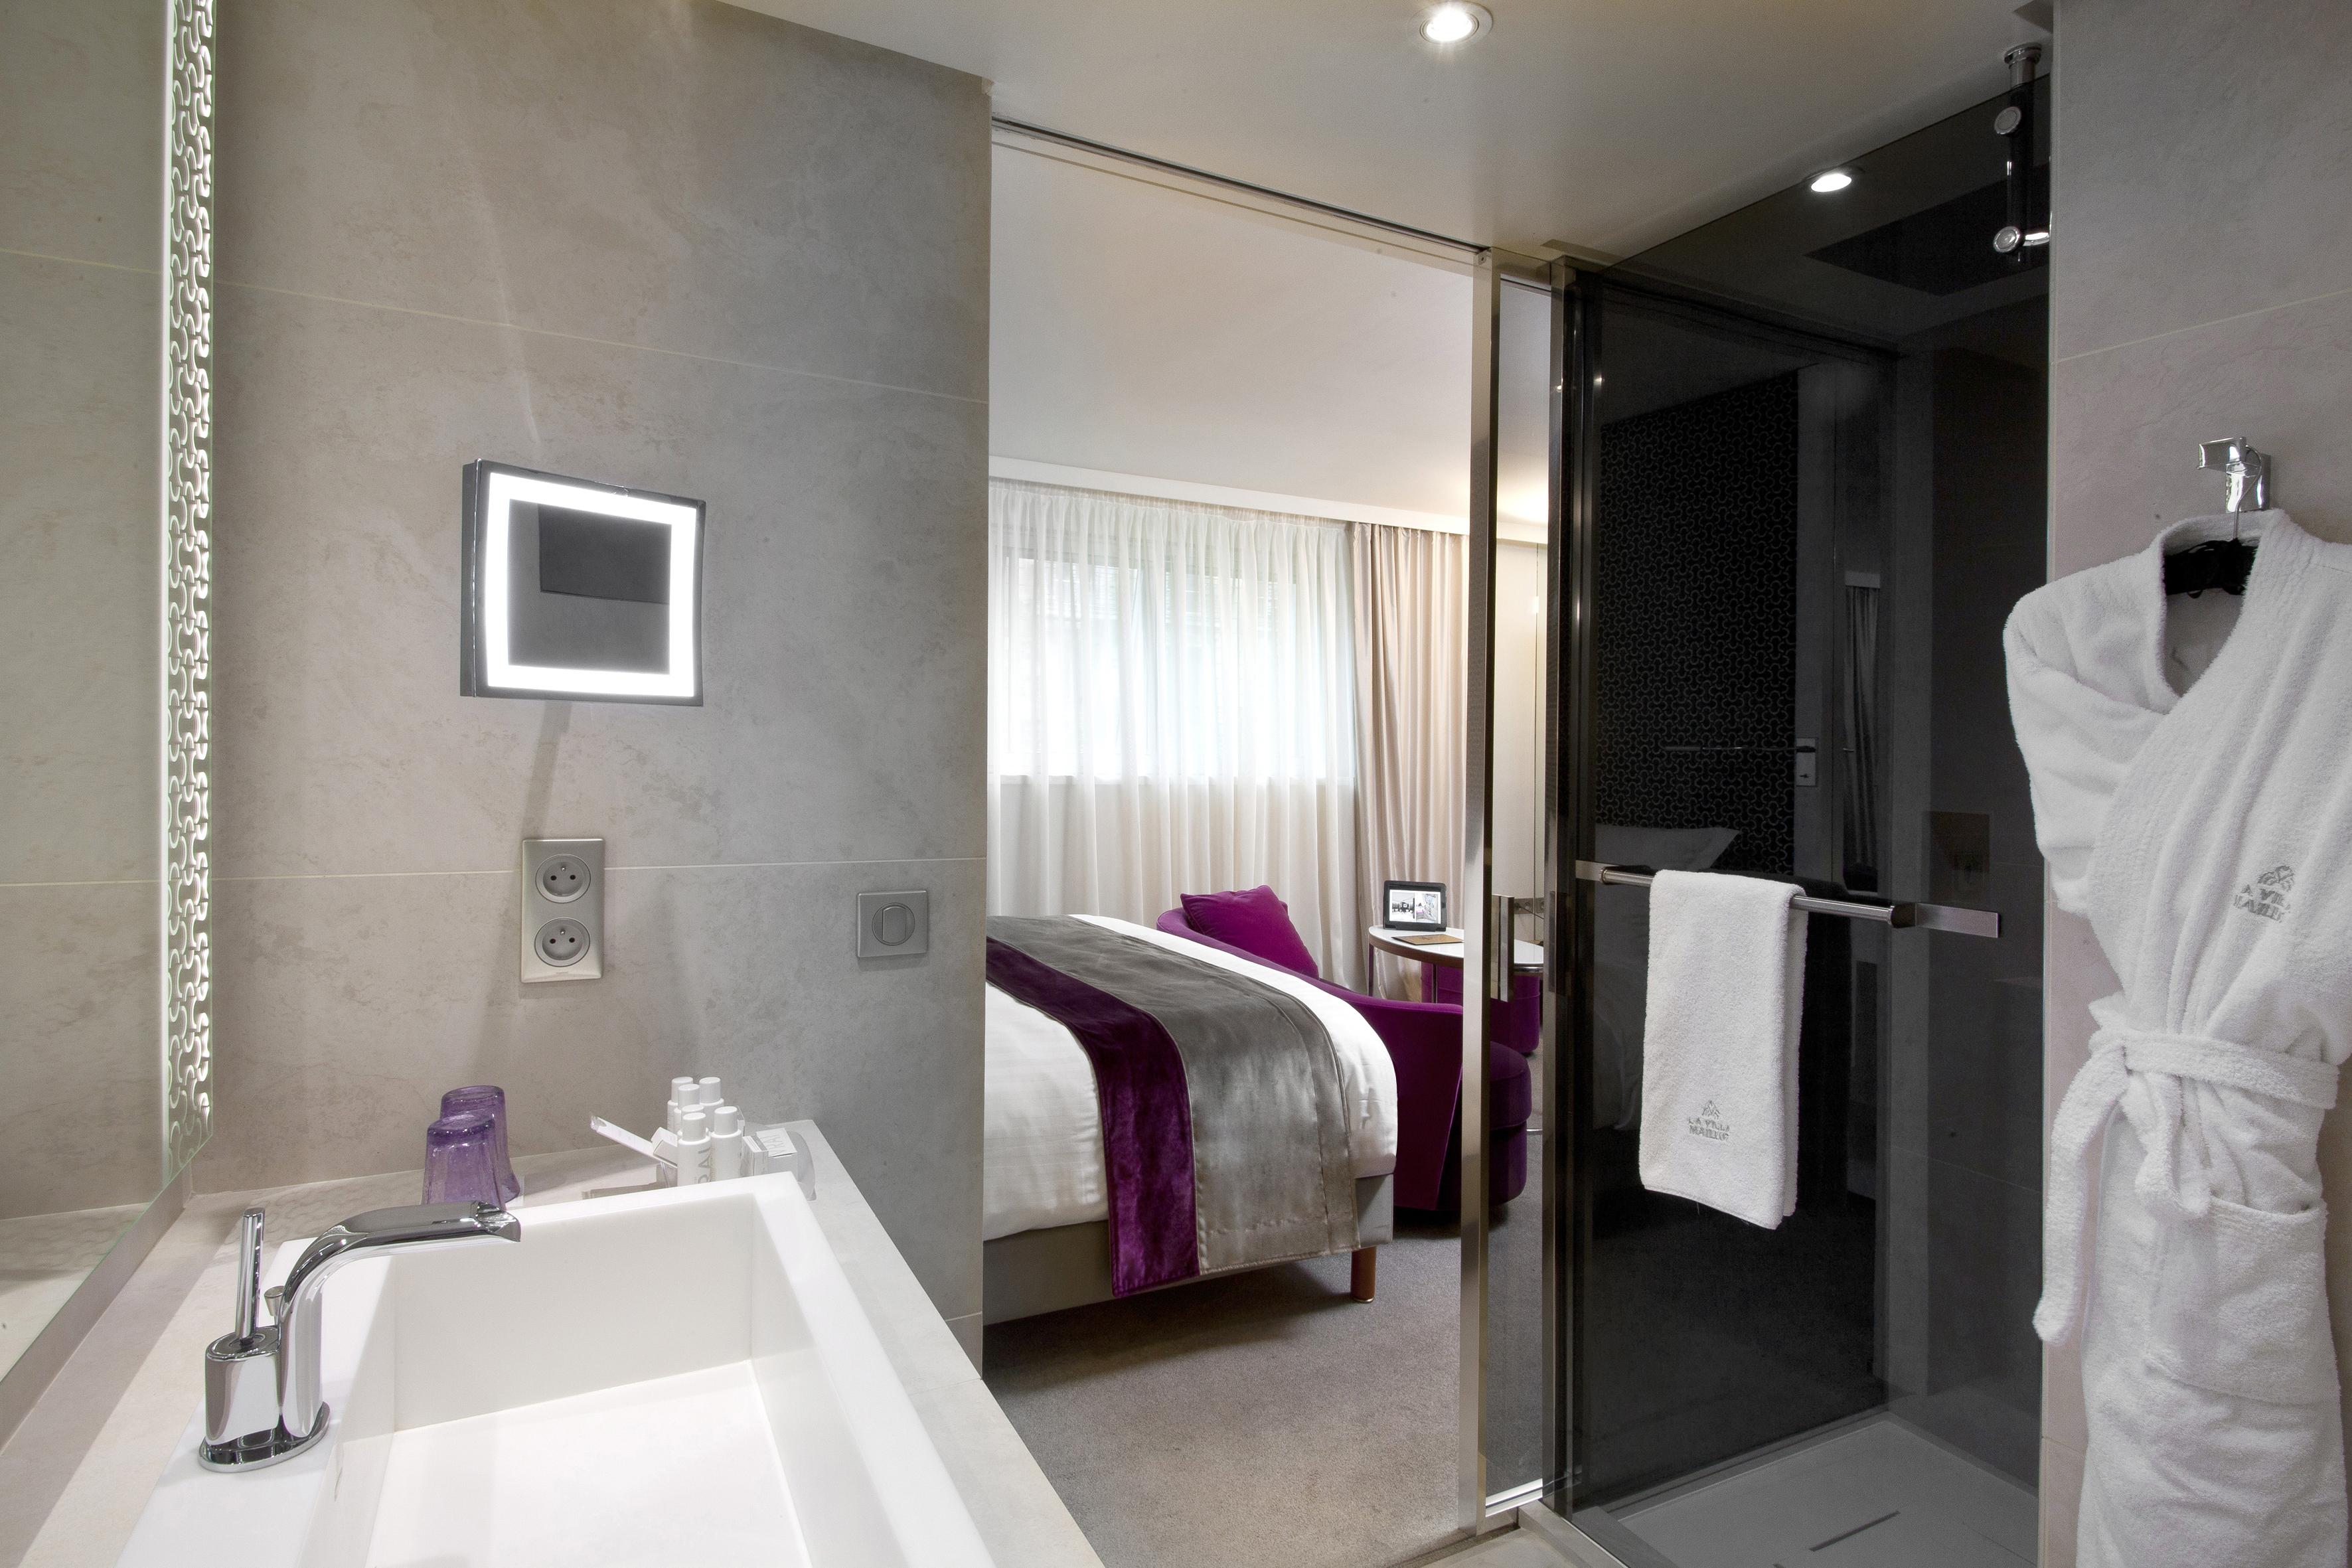 Salle de bains deluxe la villa maillot spa paris luxsure - Salle de bain roche bobois ...